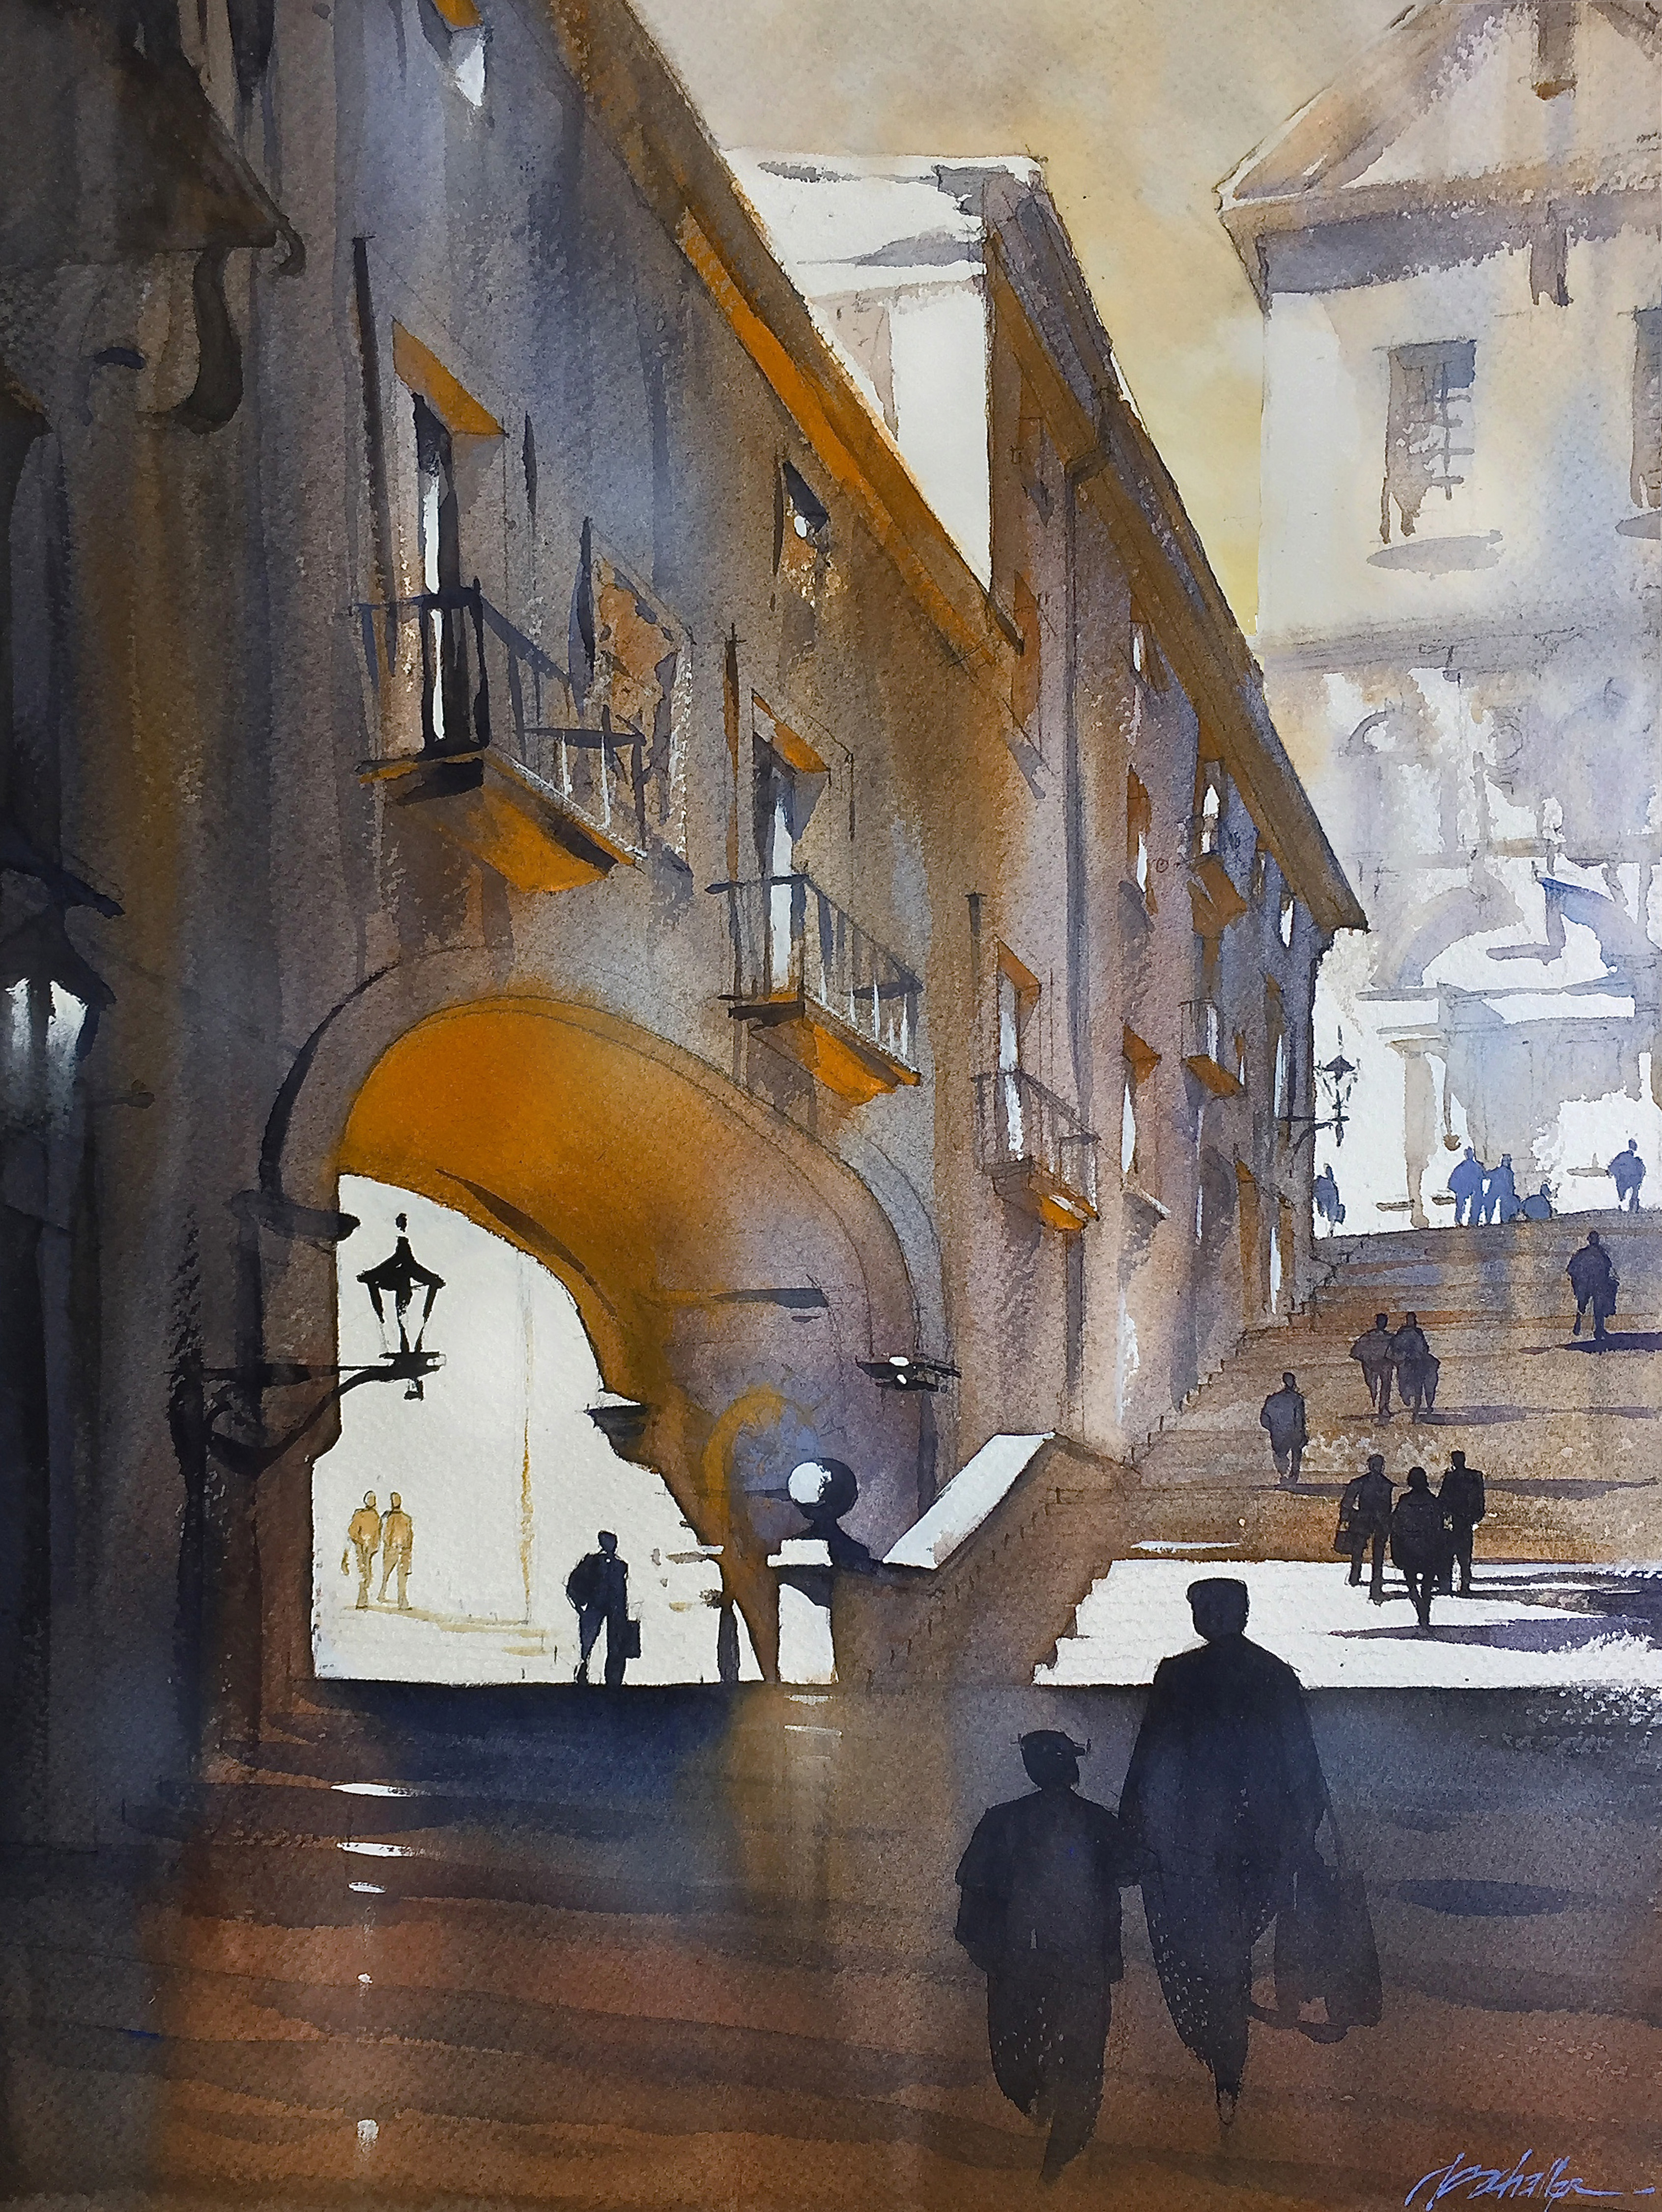 David walker artist analysis essay